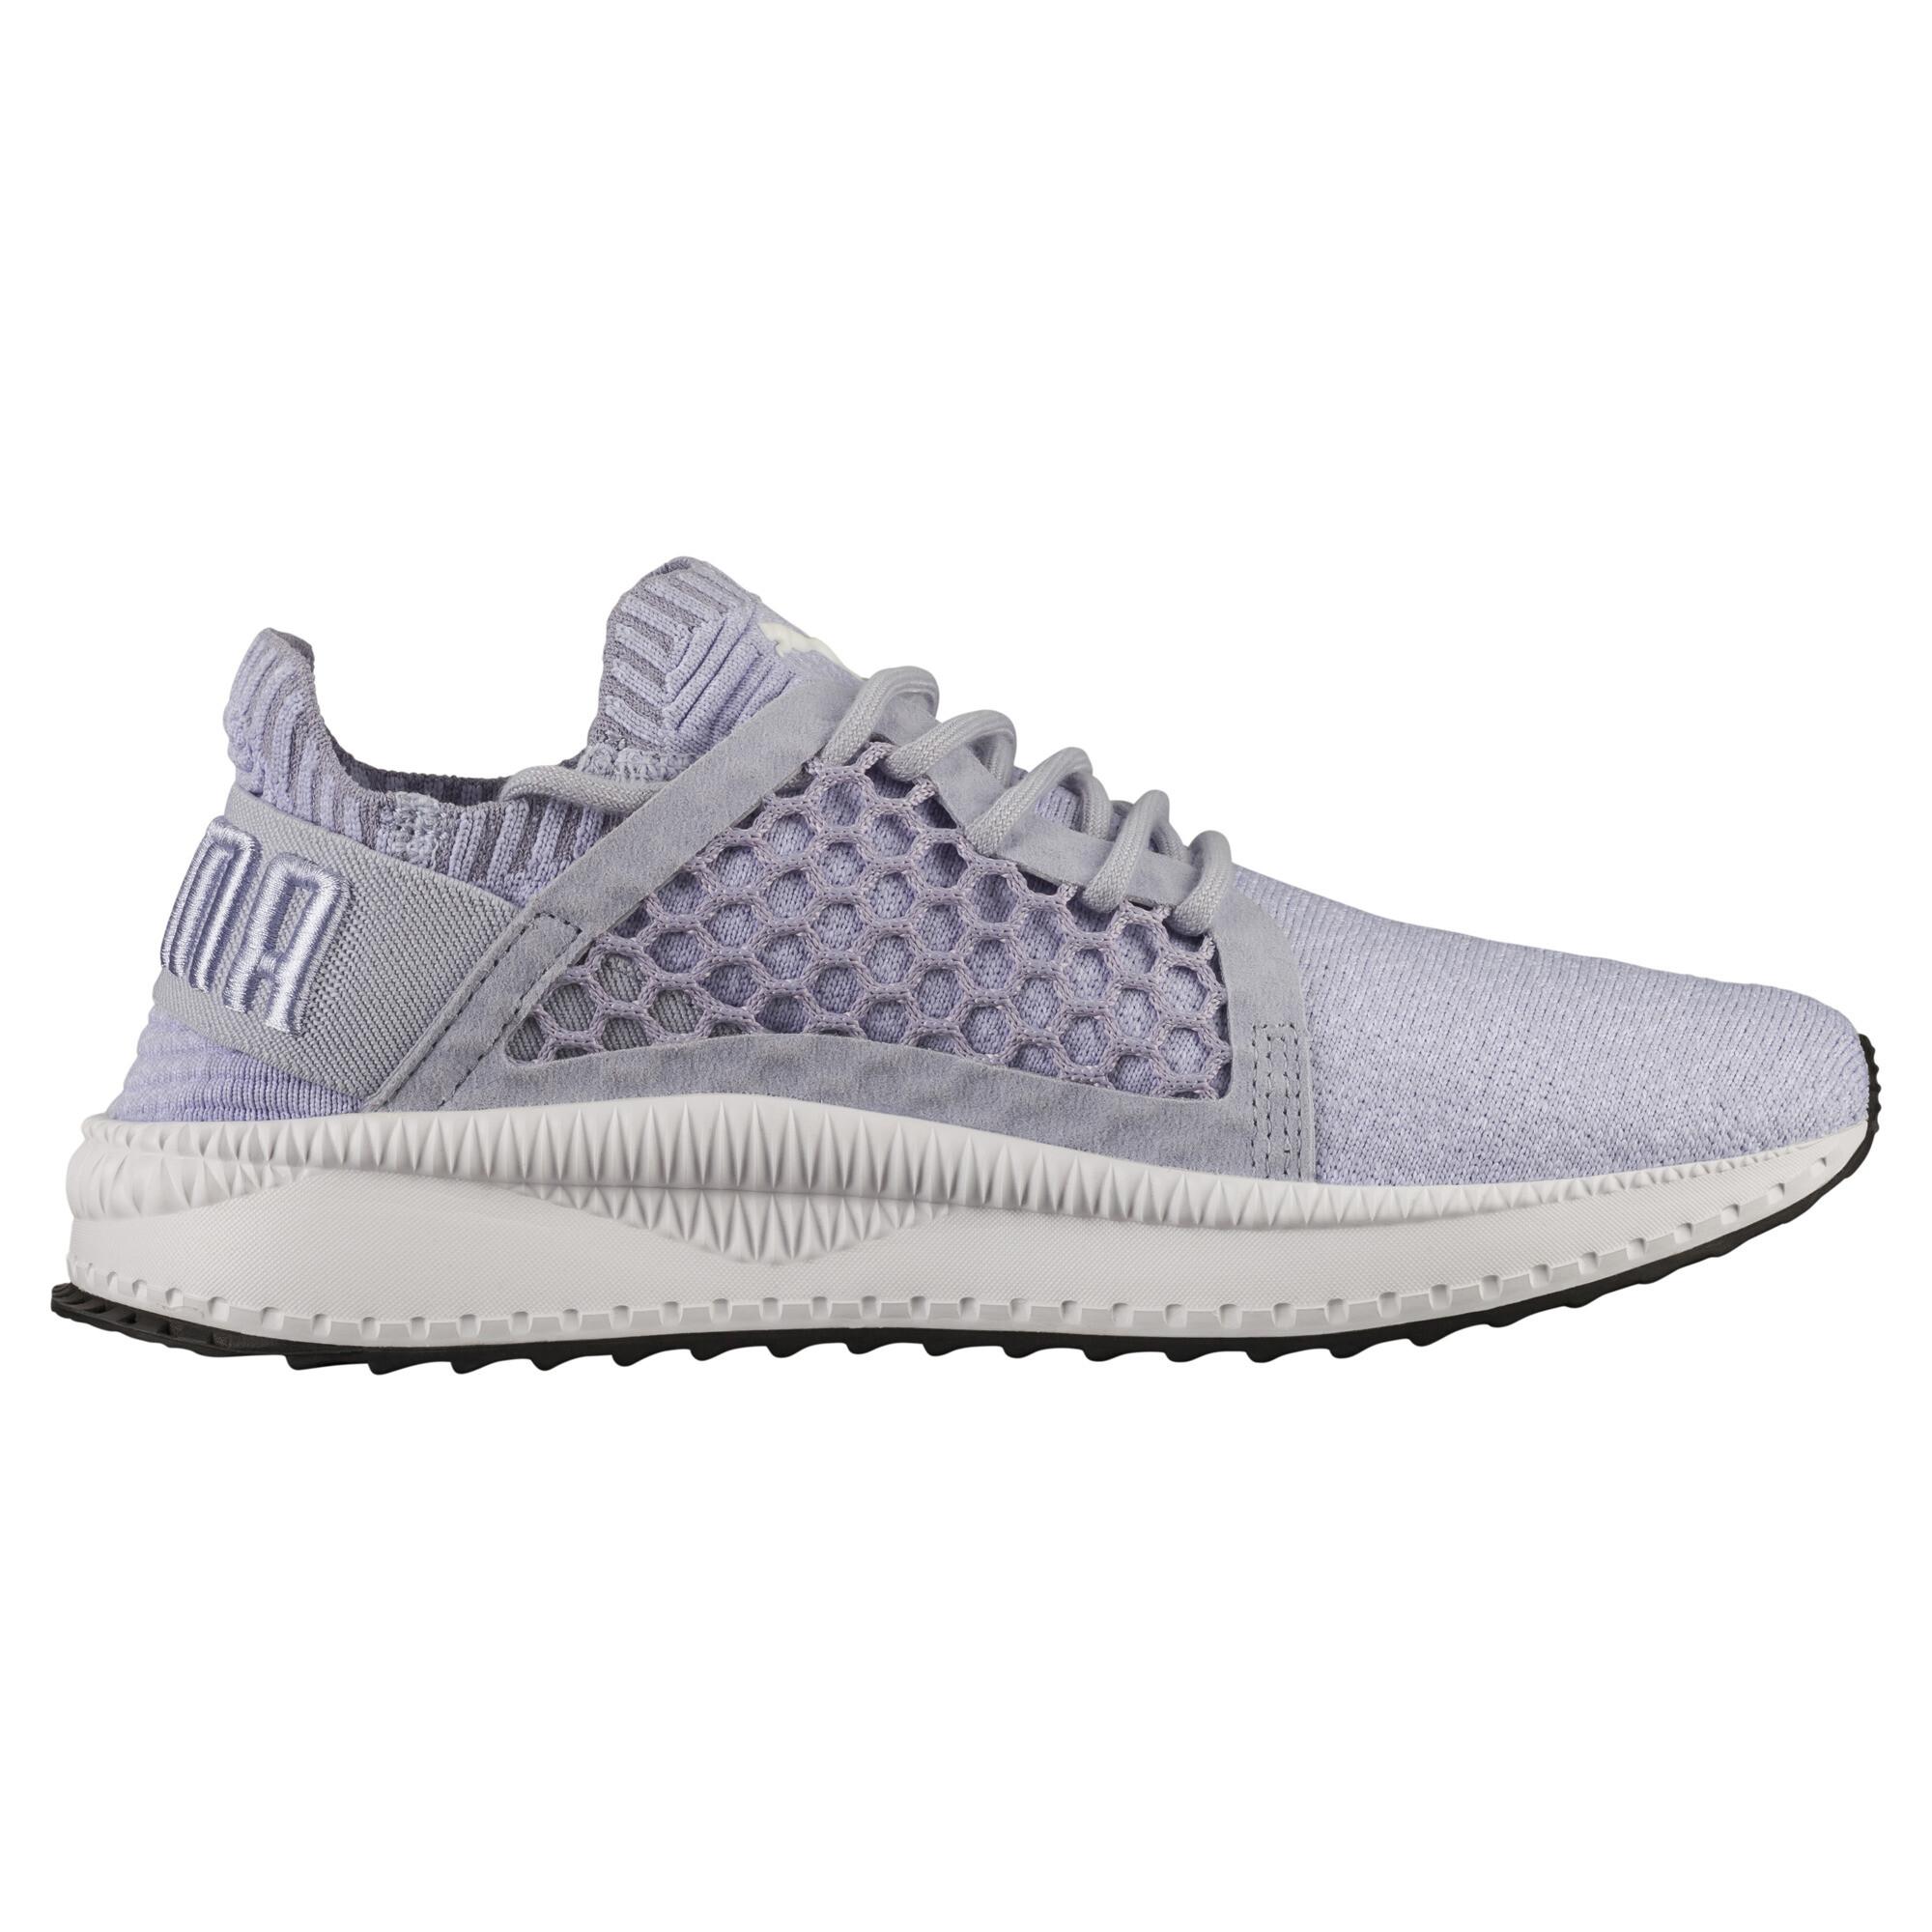 PUMA-TSUGI-NETFIT-evoKNIT-Sneaker-Frauen-Schuhe-Neu Indexbild 10